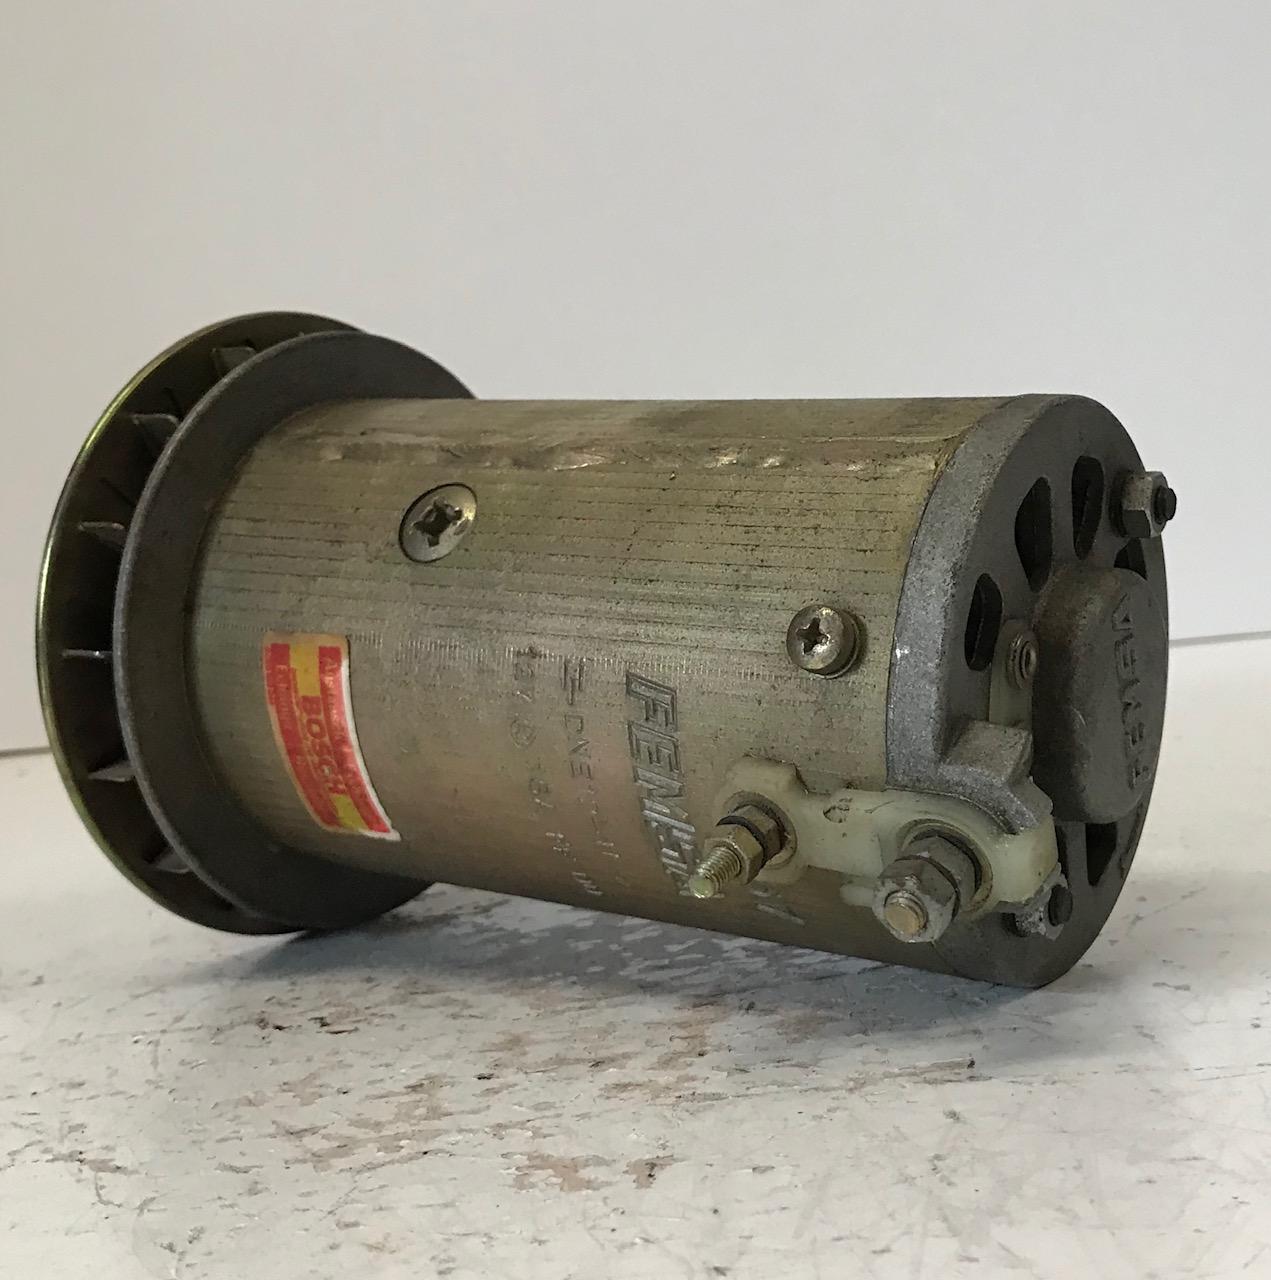 Femsa Gleichstromlichtmaschine DNE 12-11 12V/14A Generator ancre ancla anchor